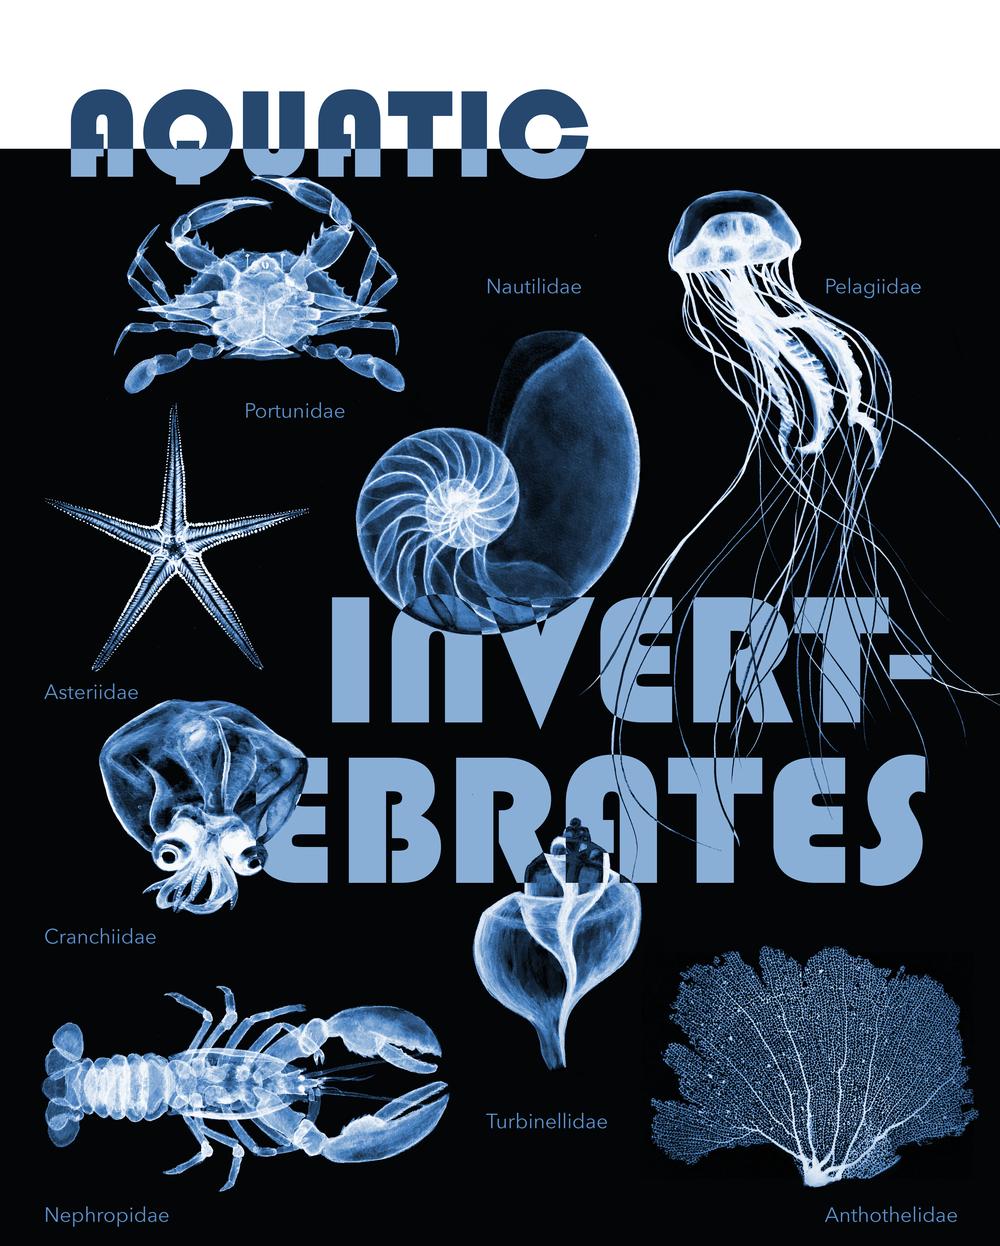 invertebrates3-01.png